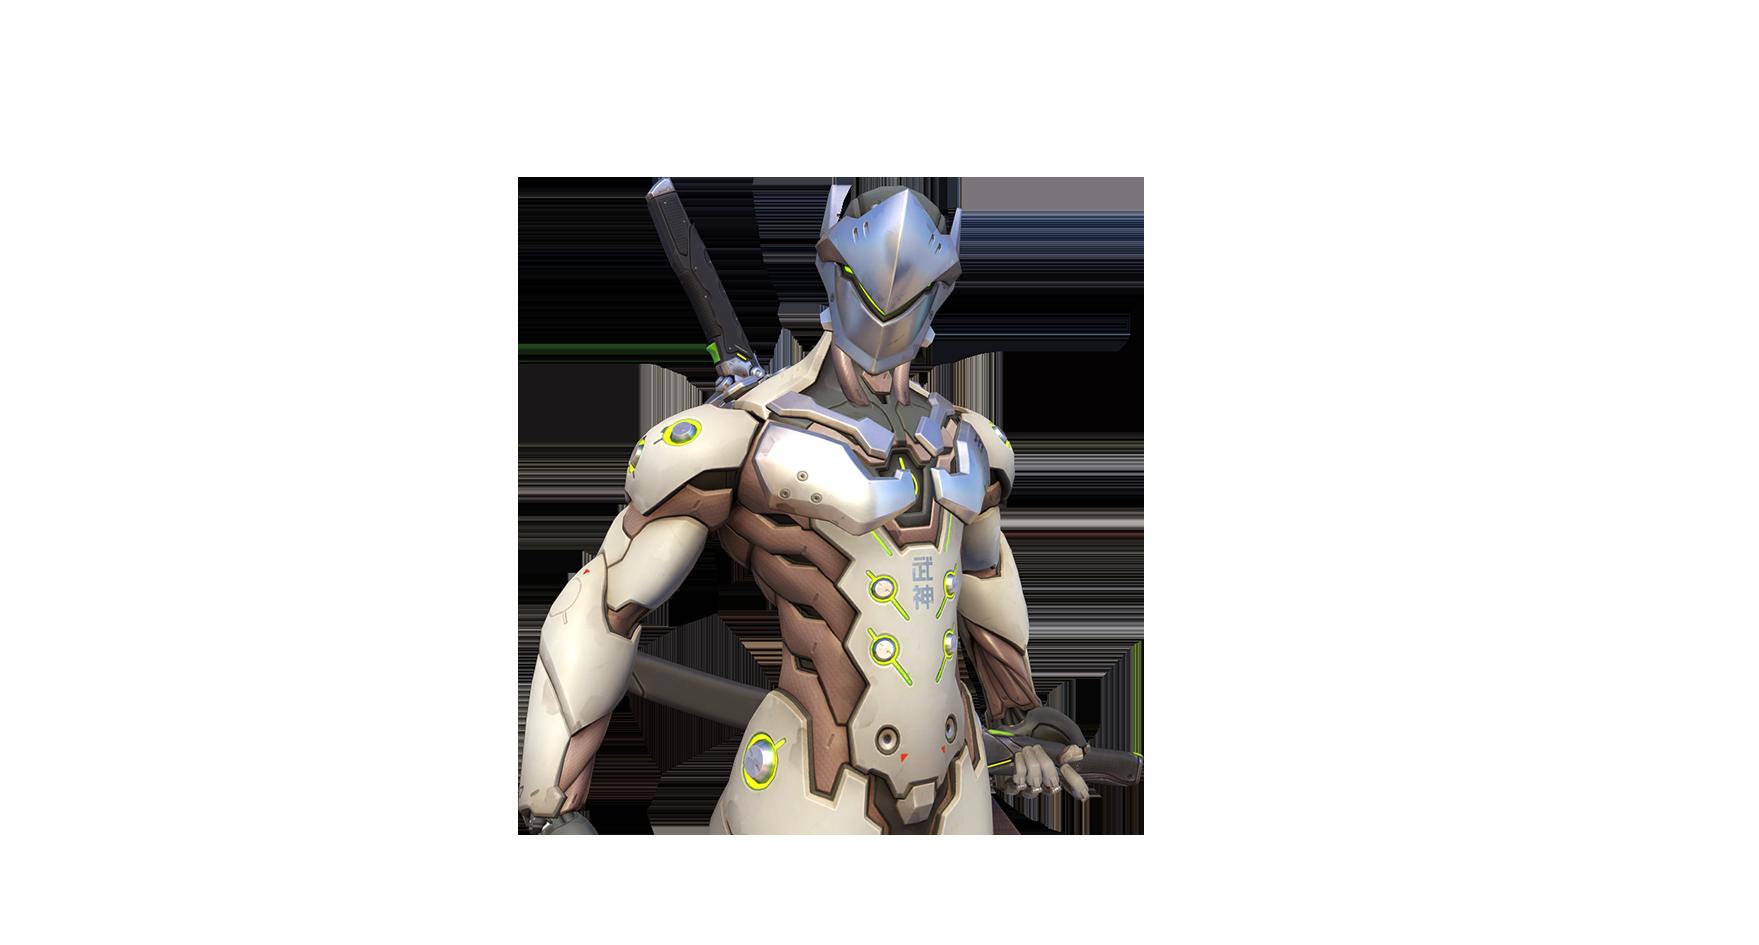 Genji overwatch png. Test patch nerfs buffs